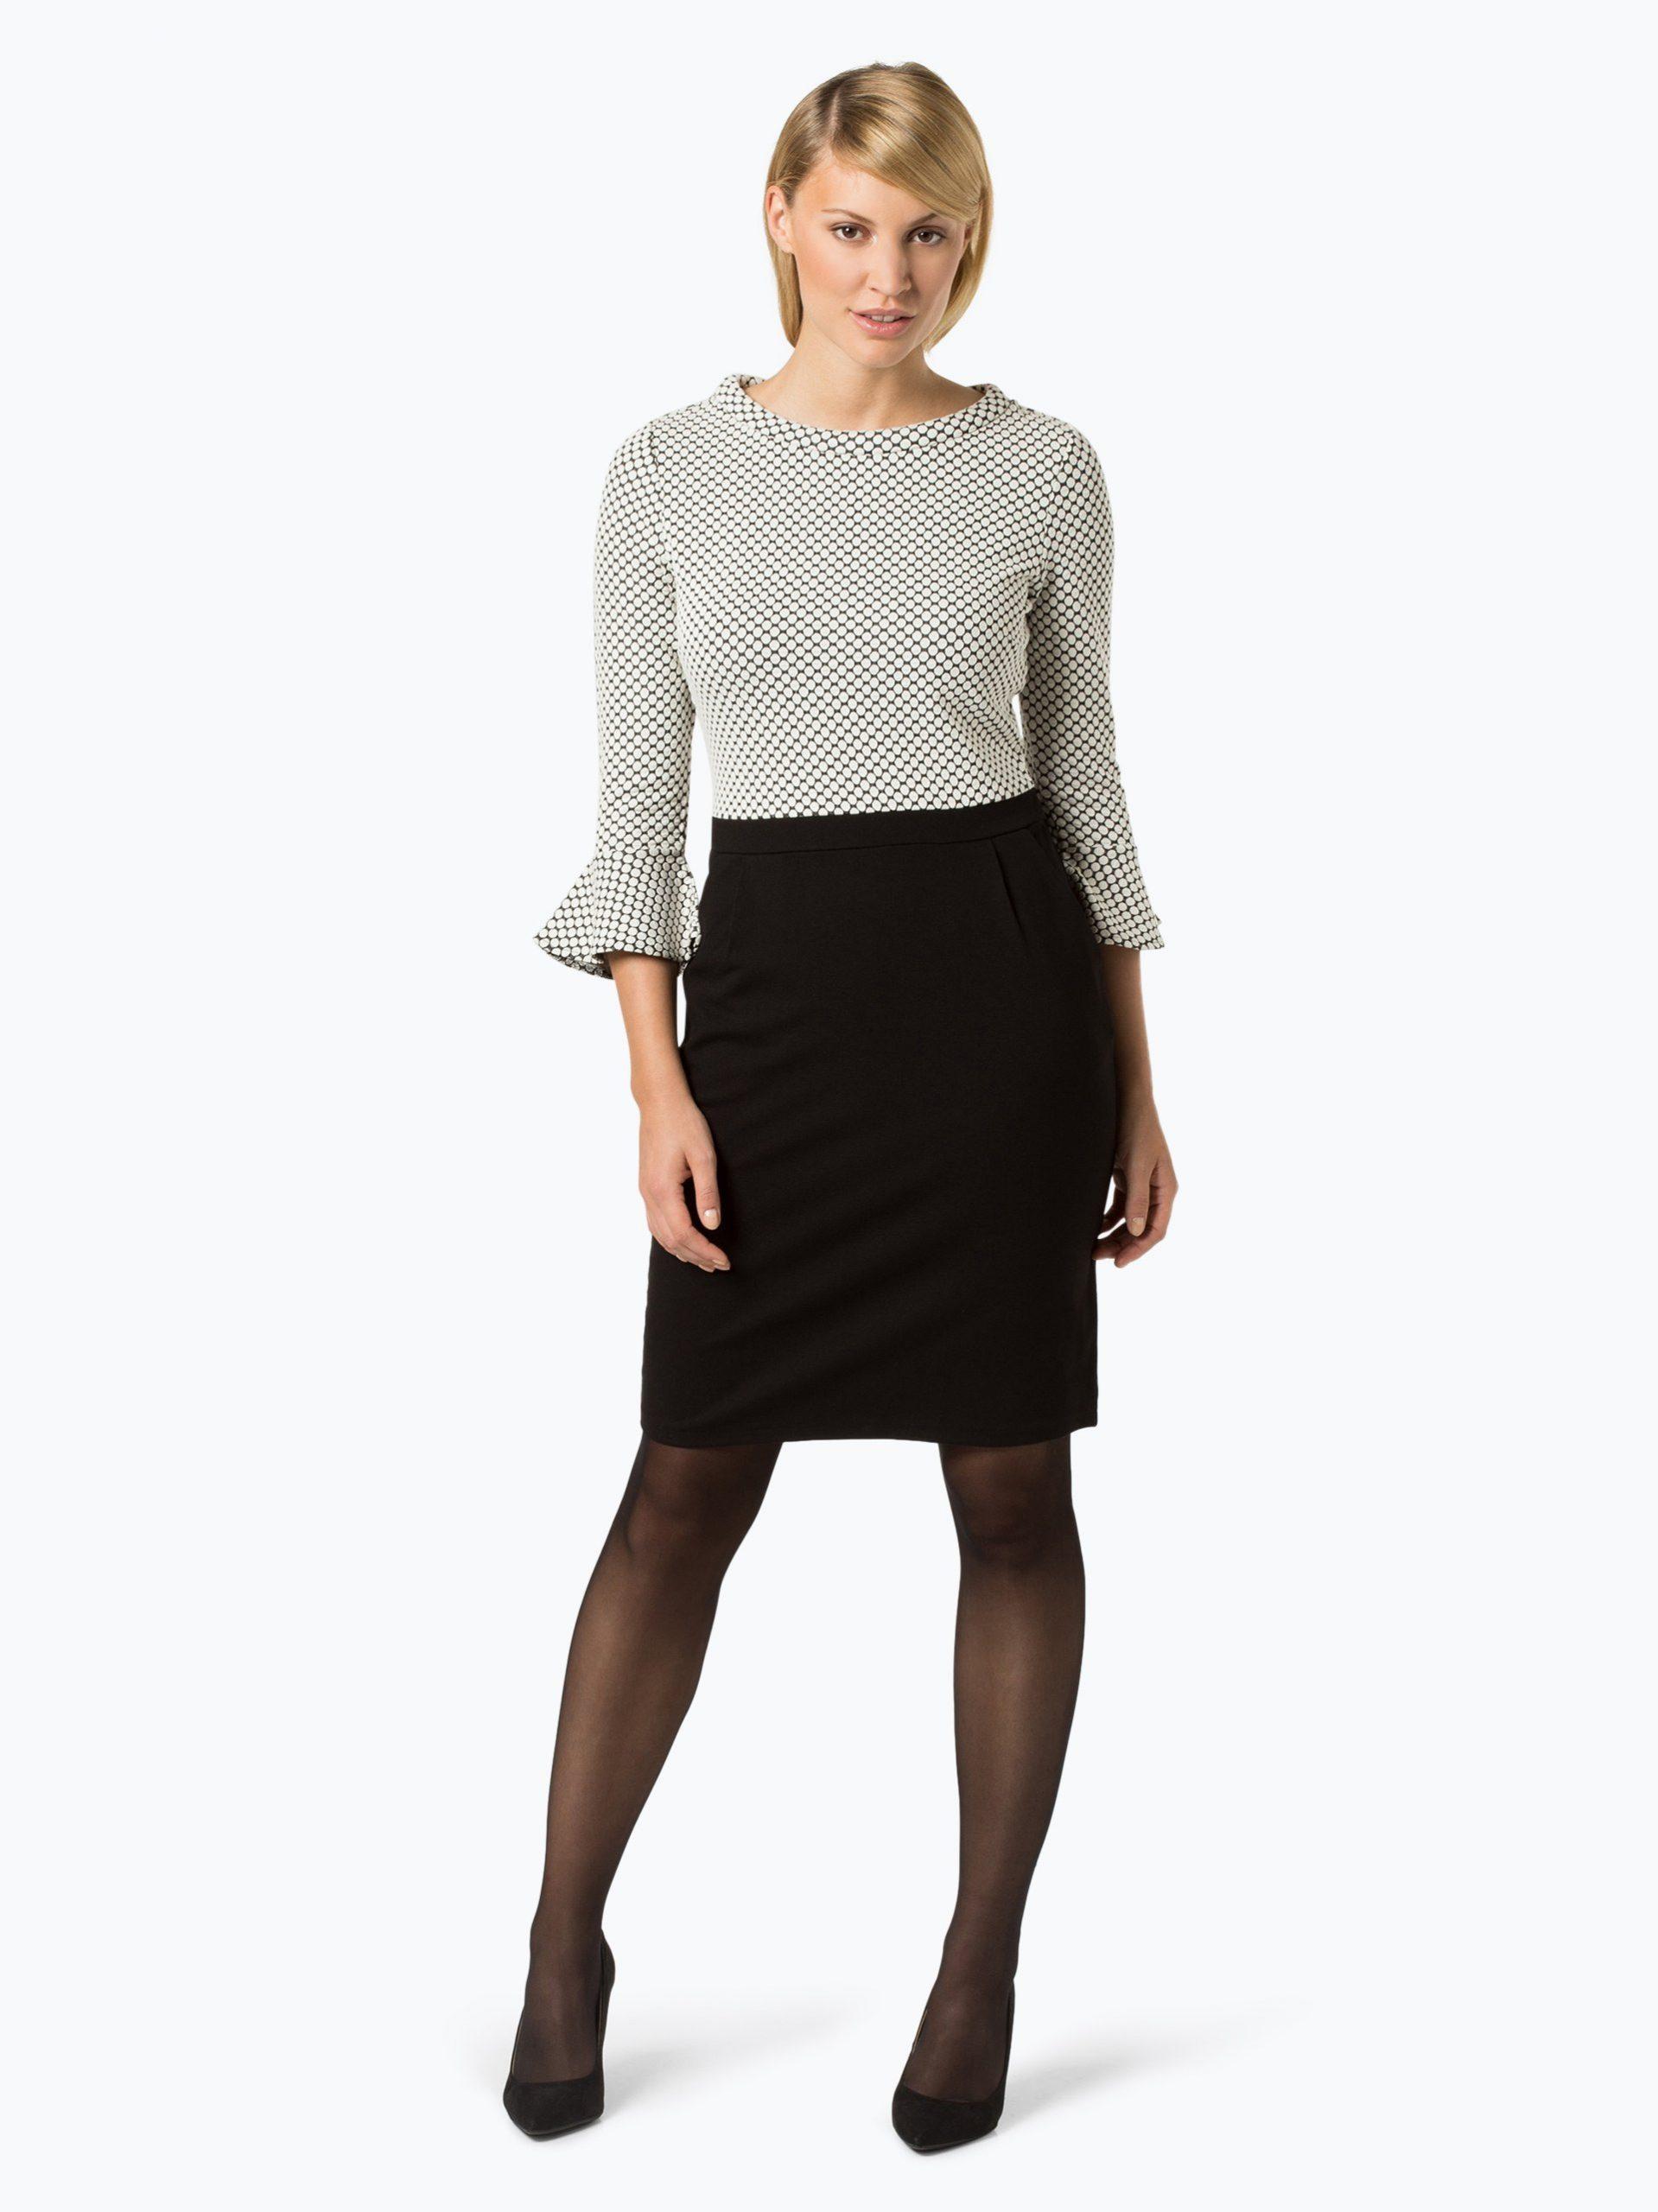 Soliver Black Label Damen Kleid Online Kaufen  Vangraaf